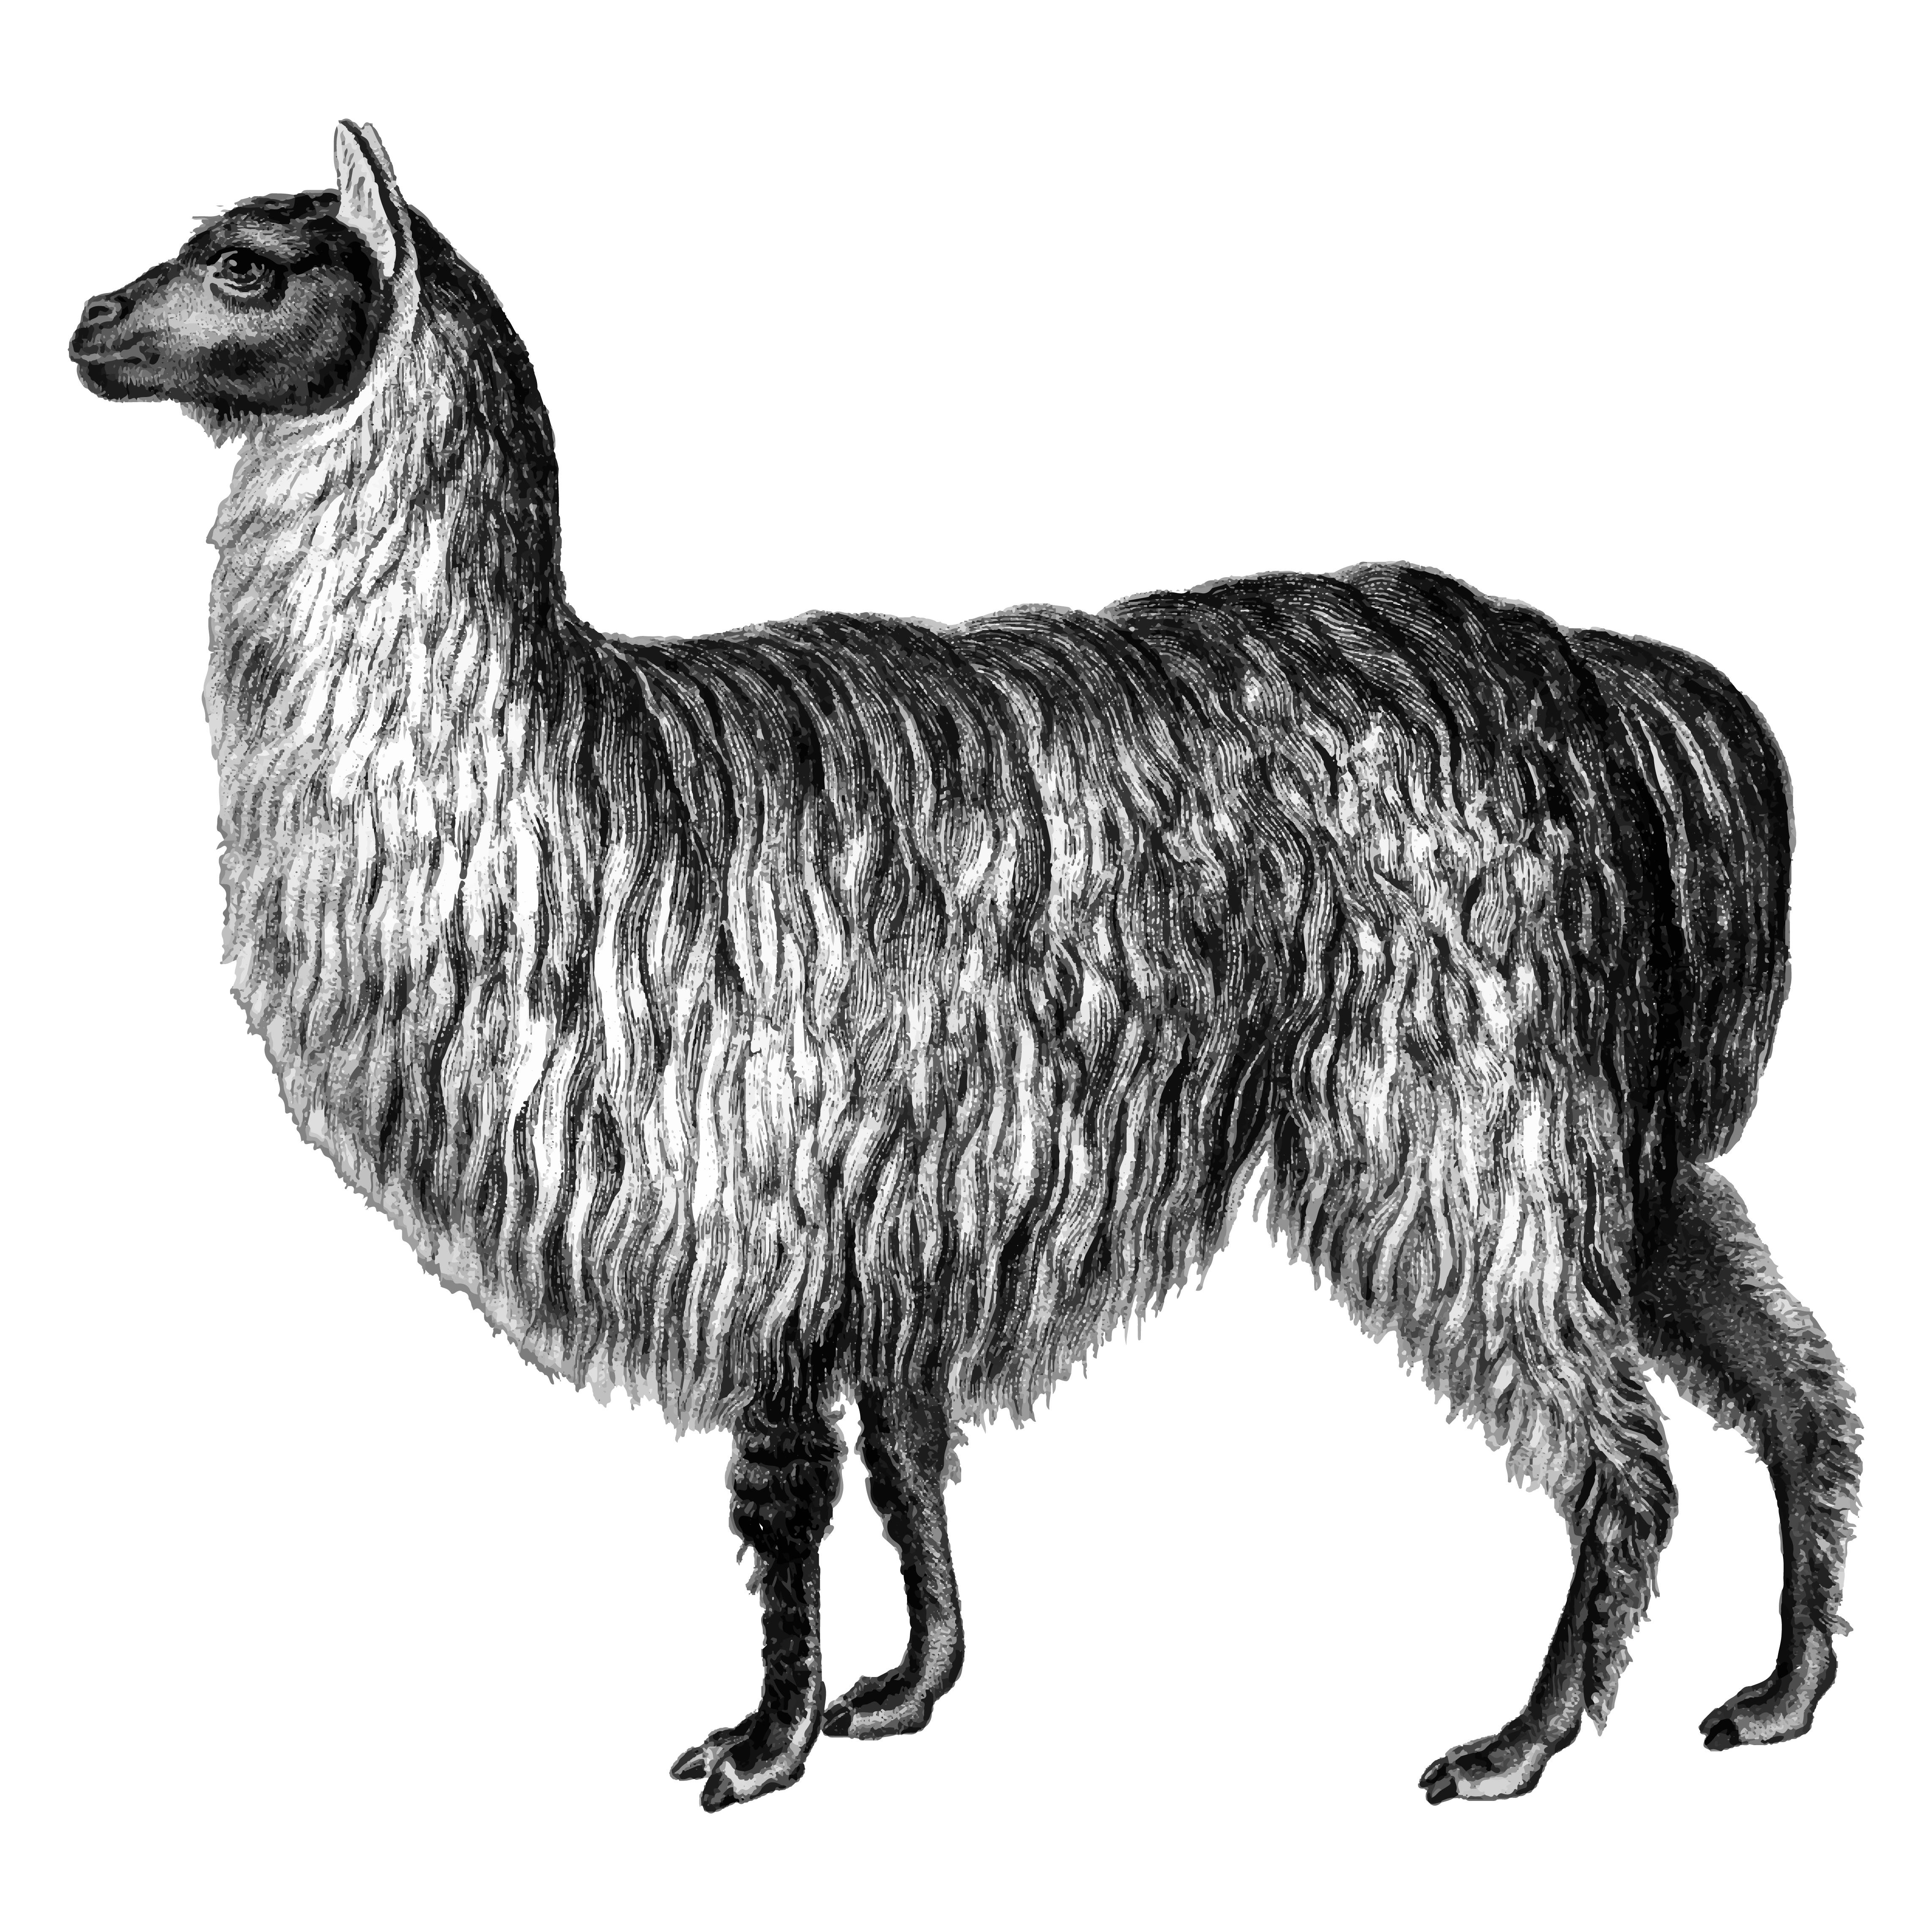 Vintage illustrations of Alpaca - Download Free Vectors ...